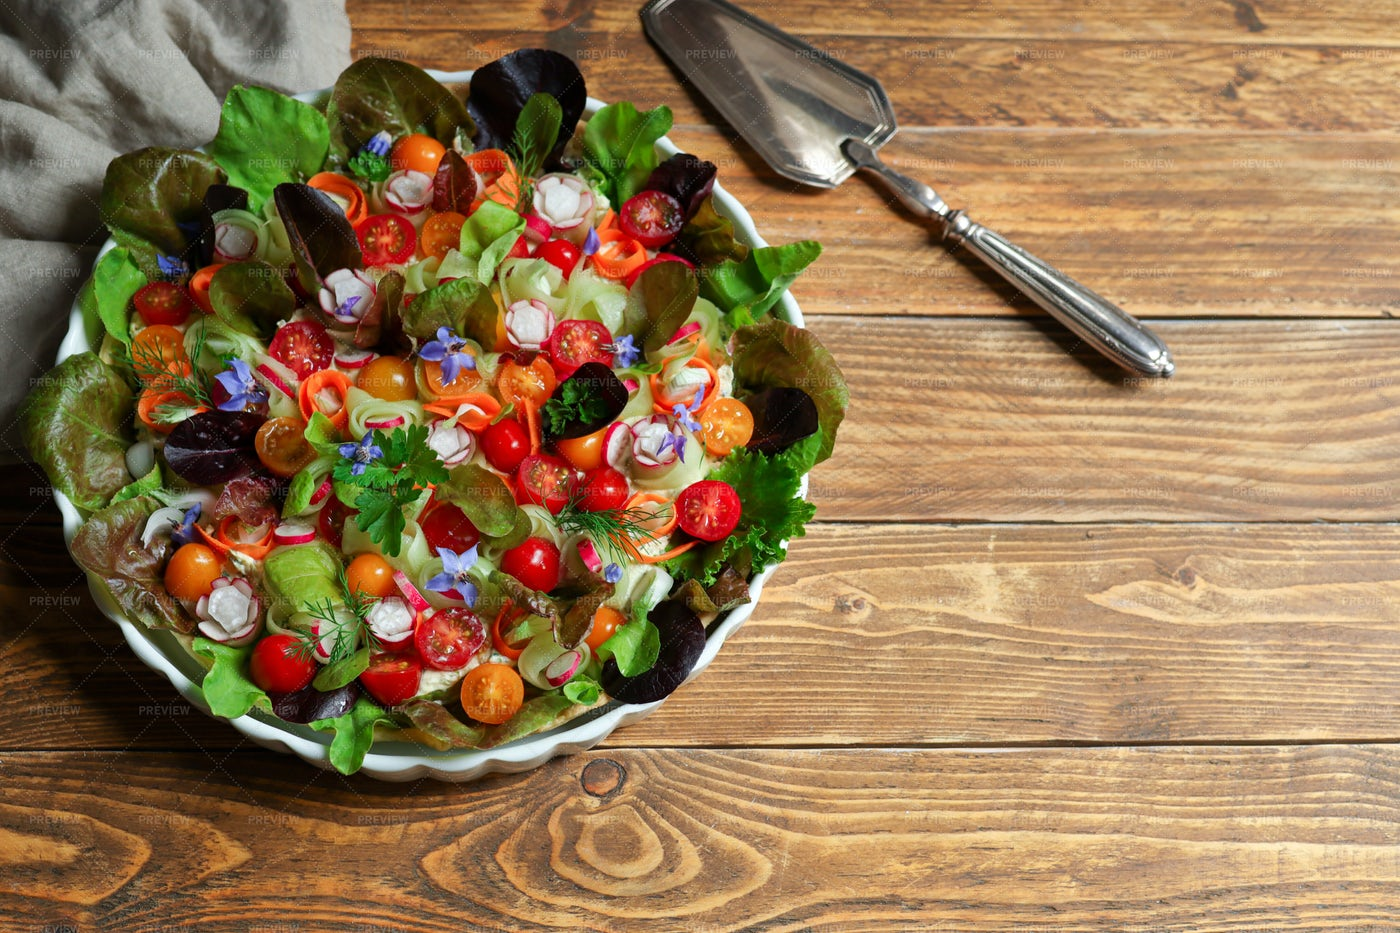 Pie With Vegetables: Stock Photos